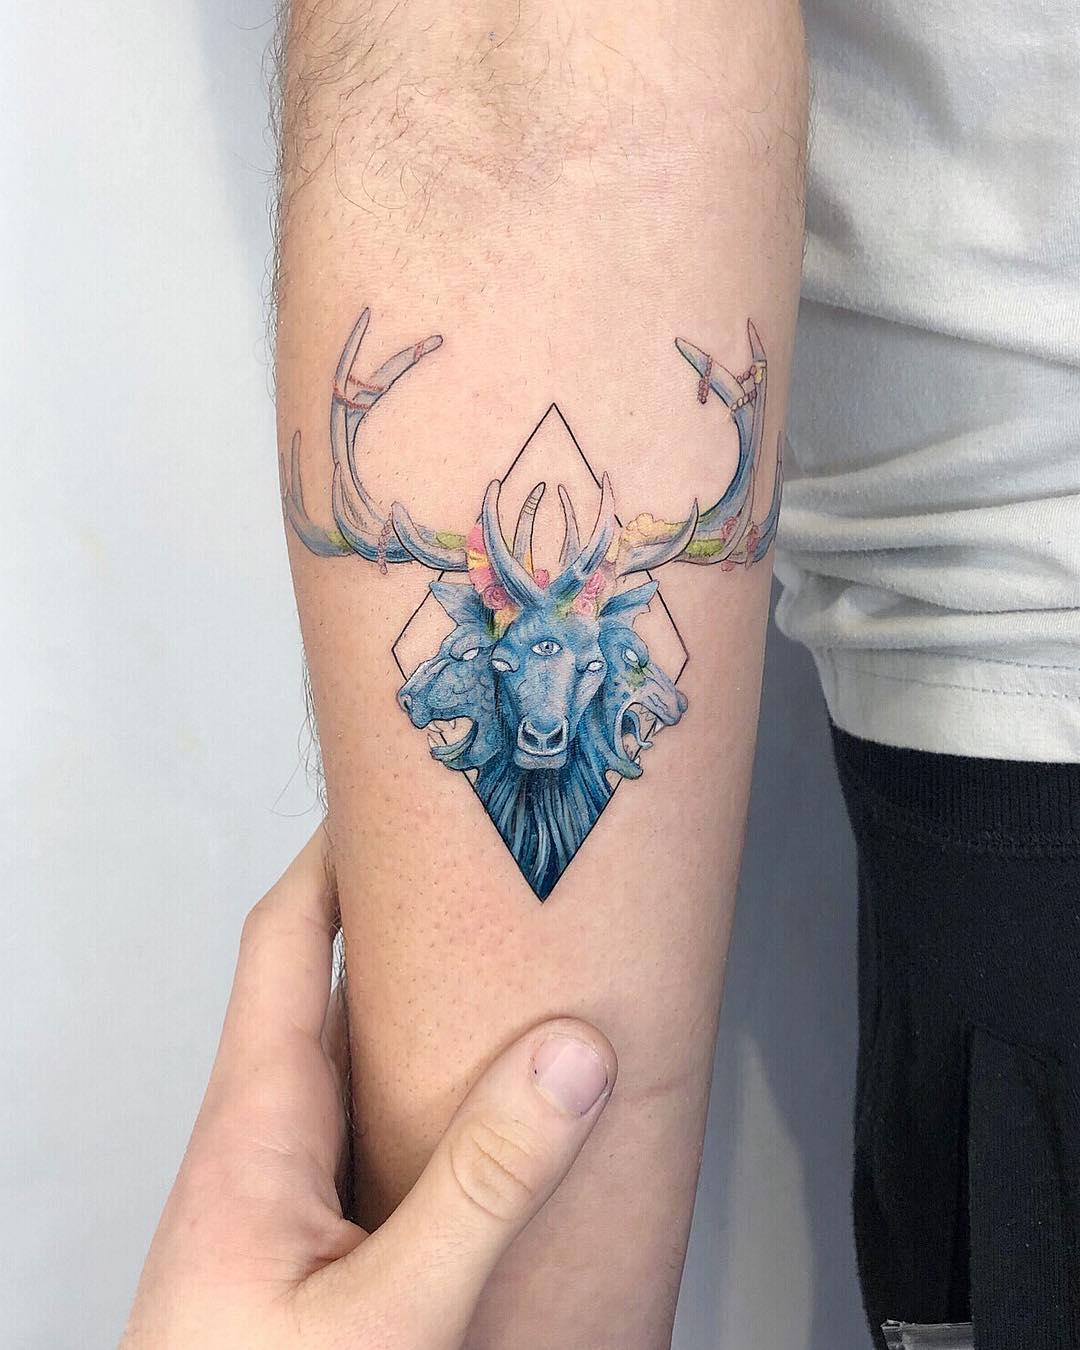 Mastodon album cover tattoo by Eden Kozo